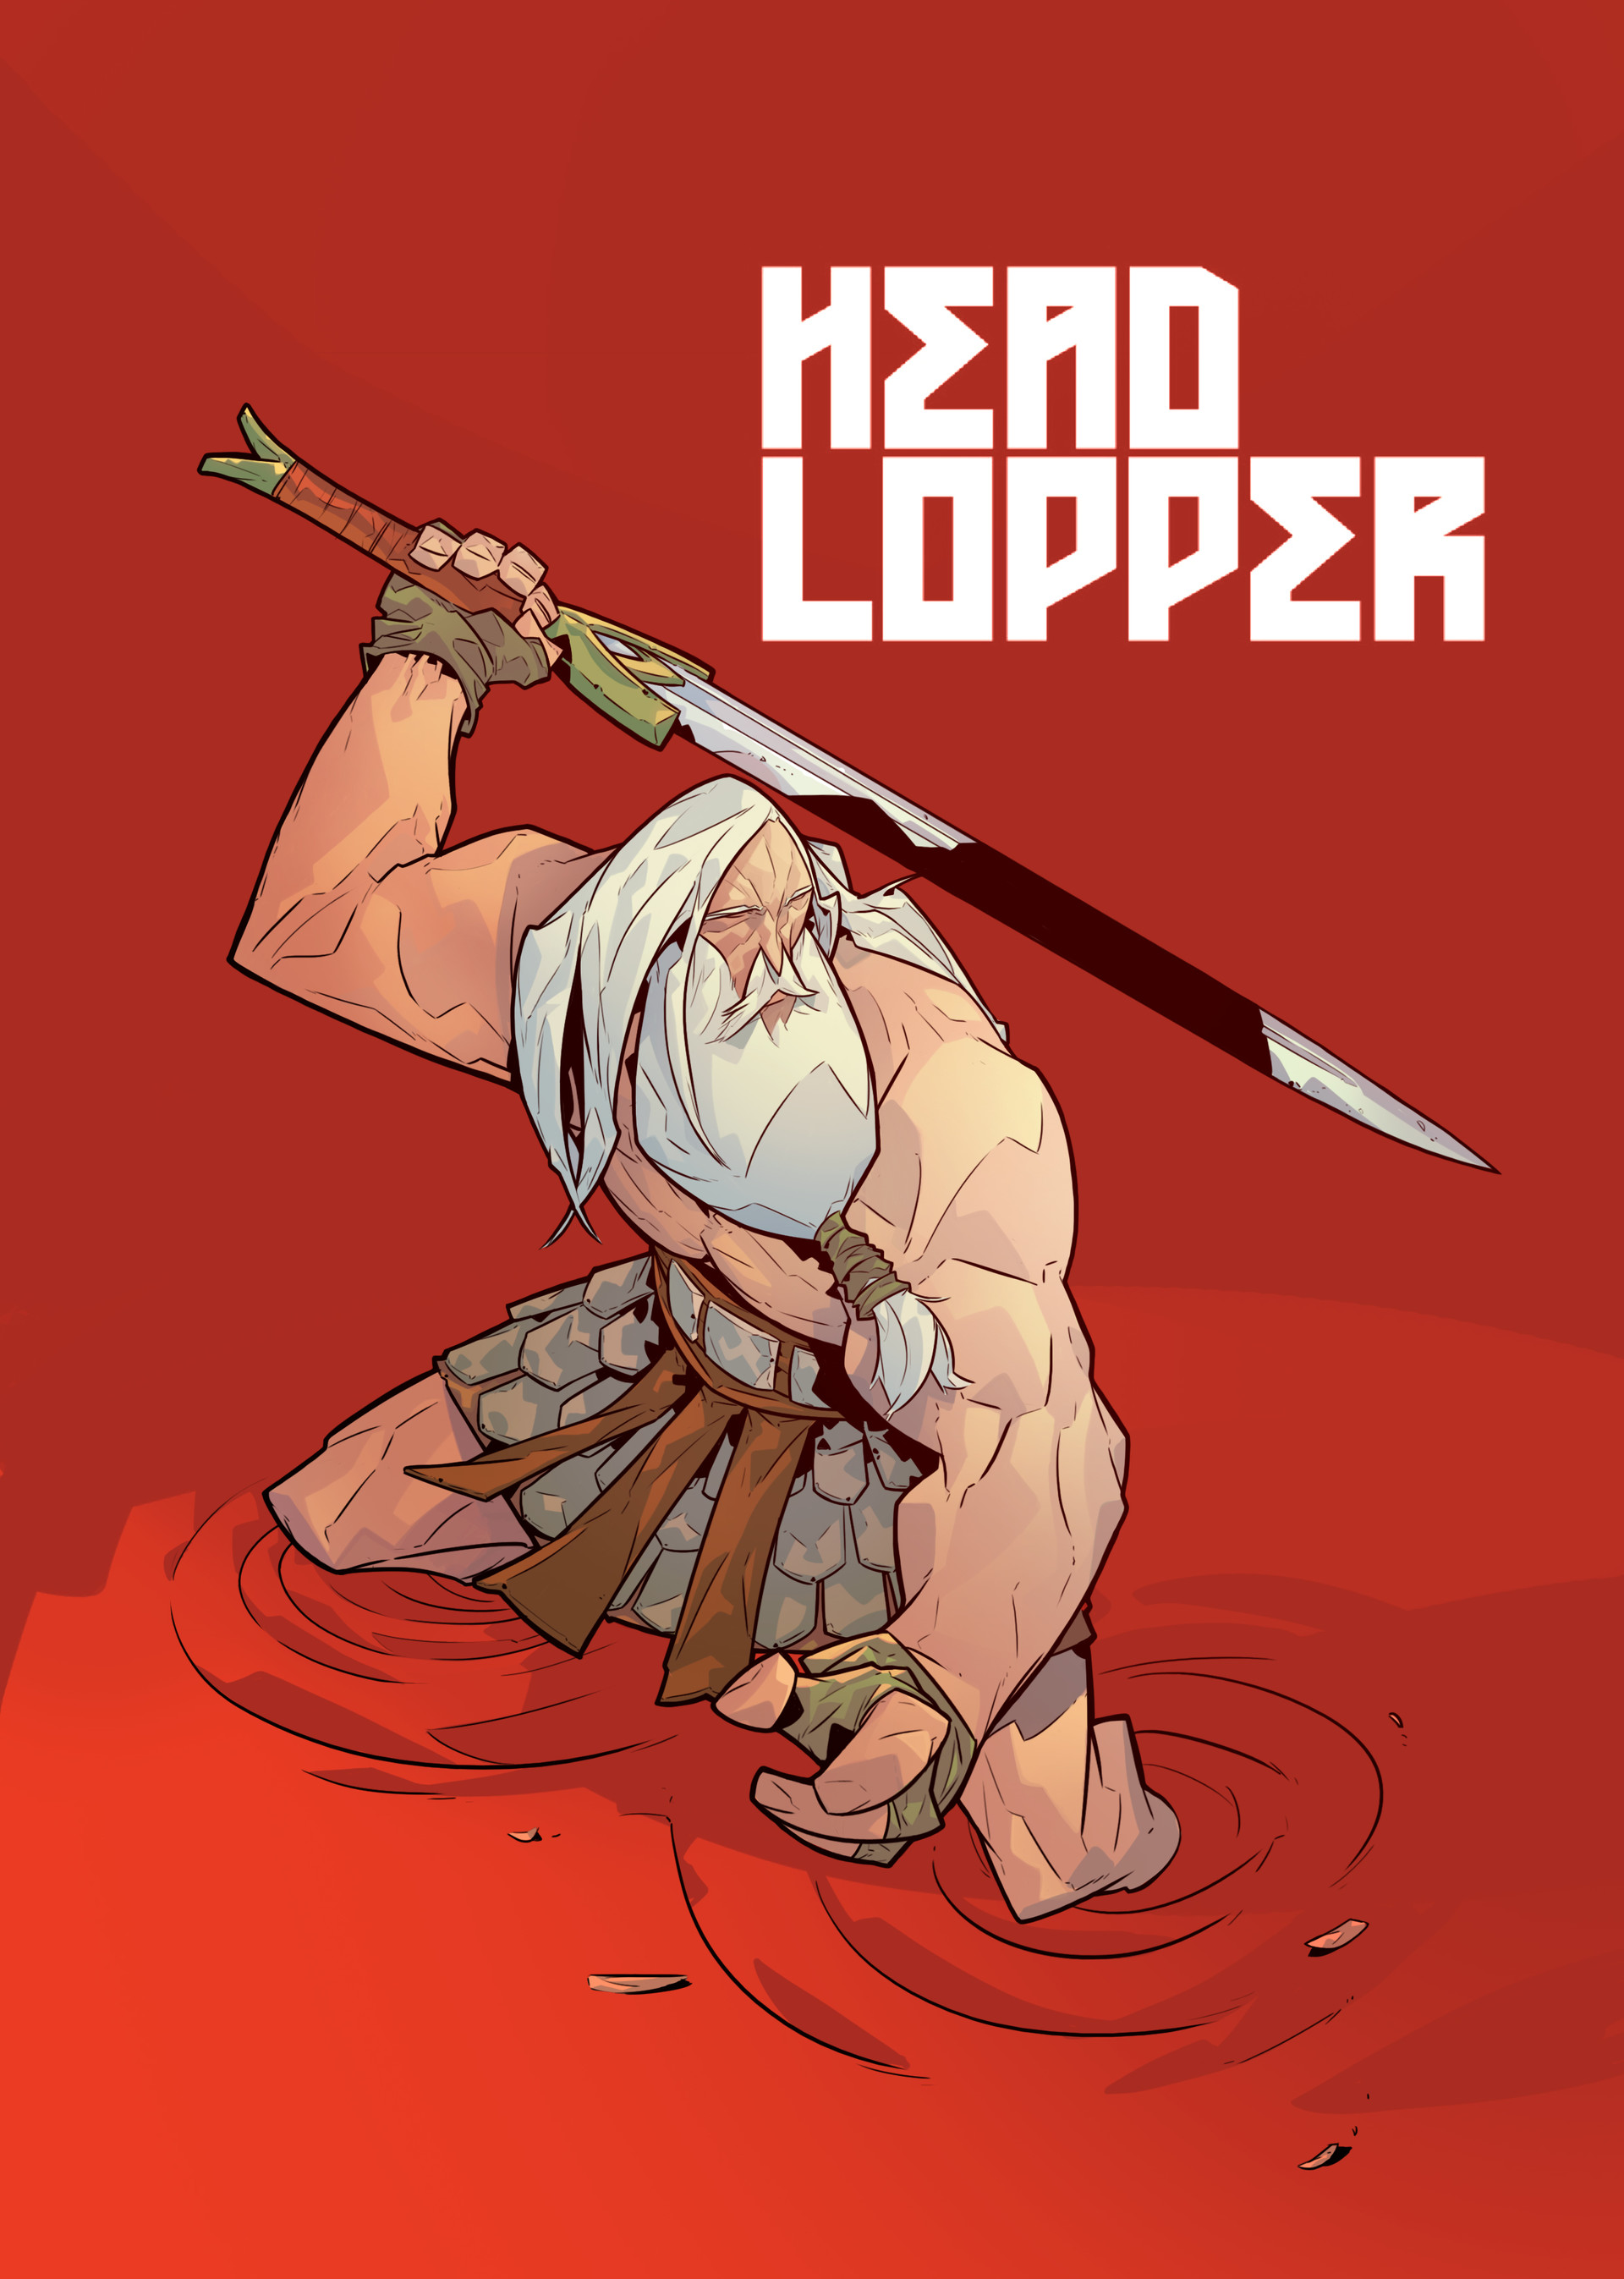 ivan-elyasov-hex-lopper-2